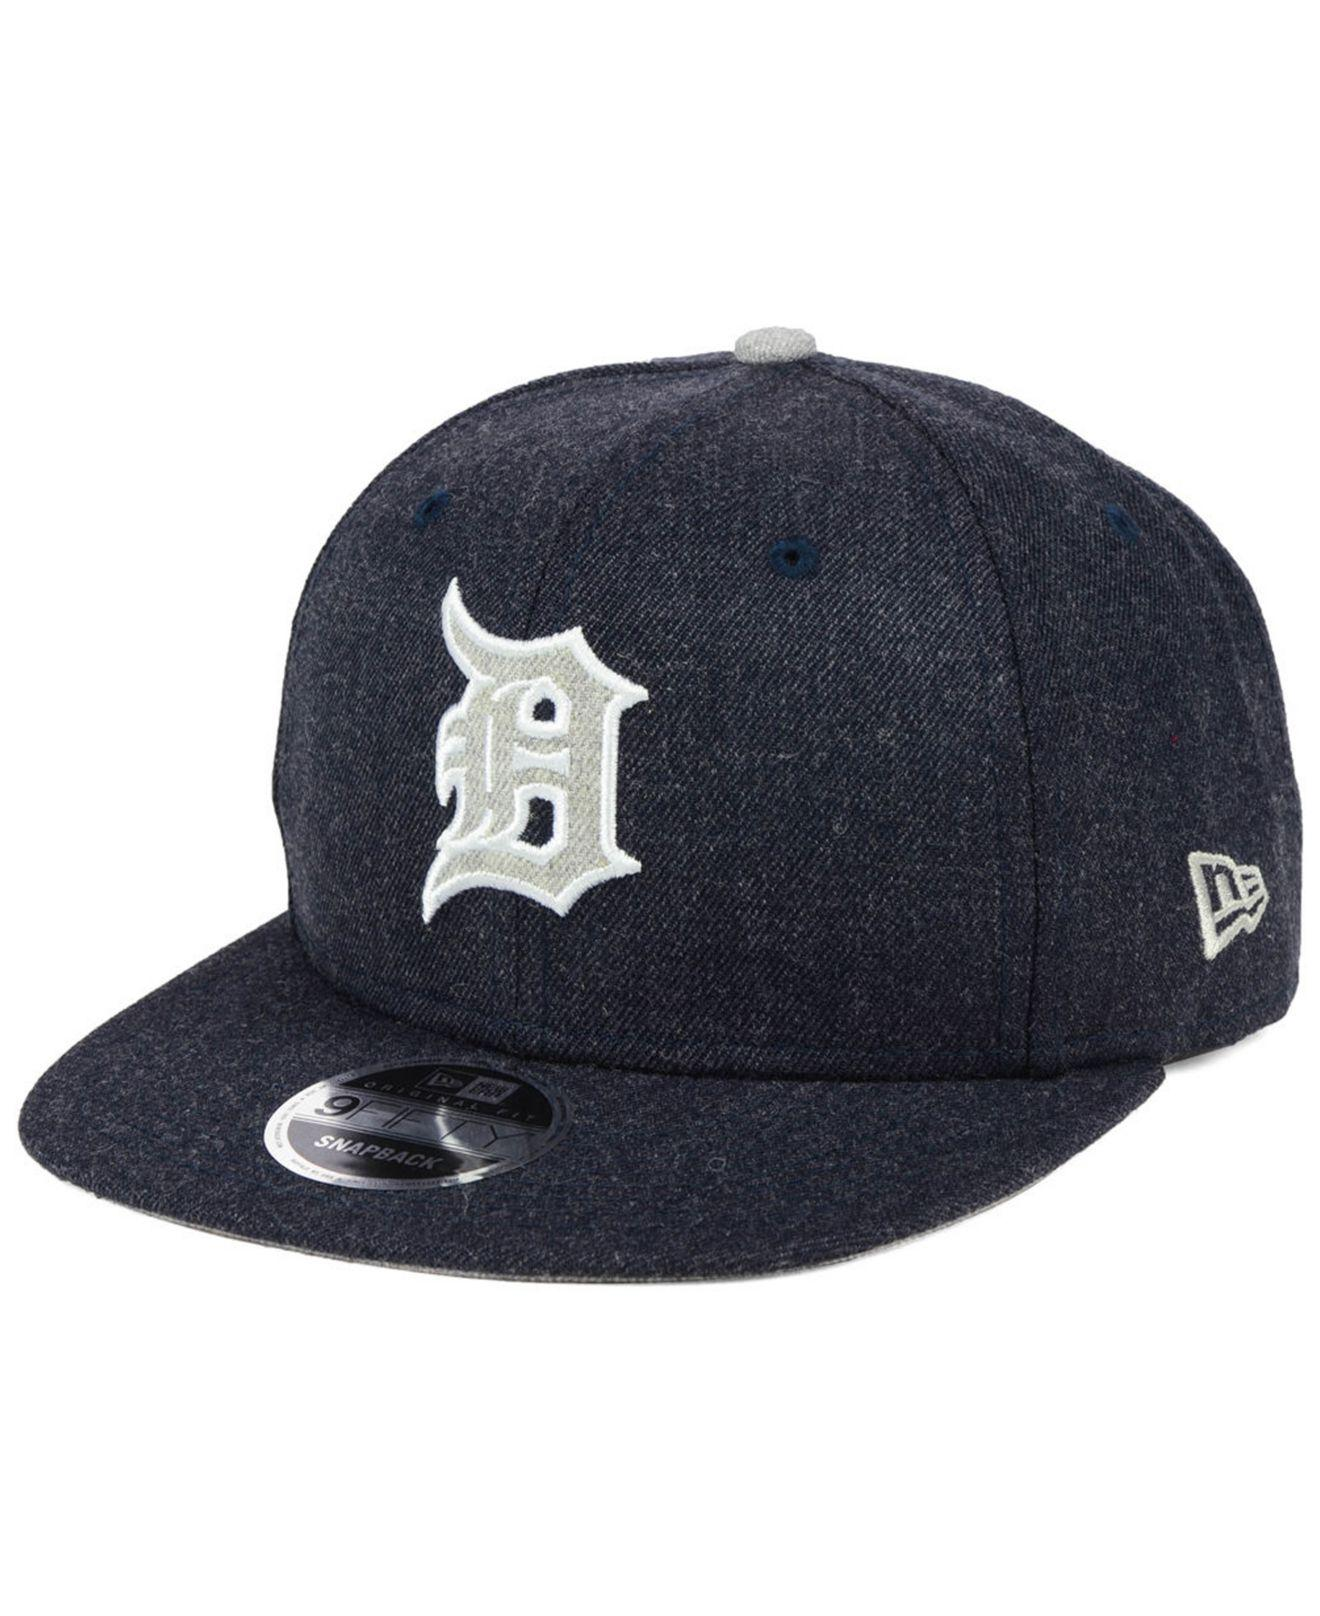 online retailer e0b5d c03af ... denmark lyst ktz detroit tigers heather hype 9fifty snapback cap in blue  8e808 ee171